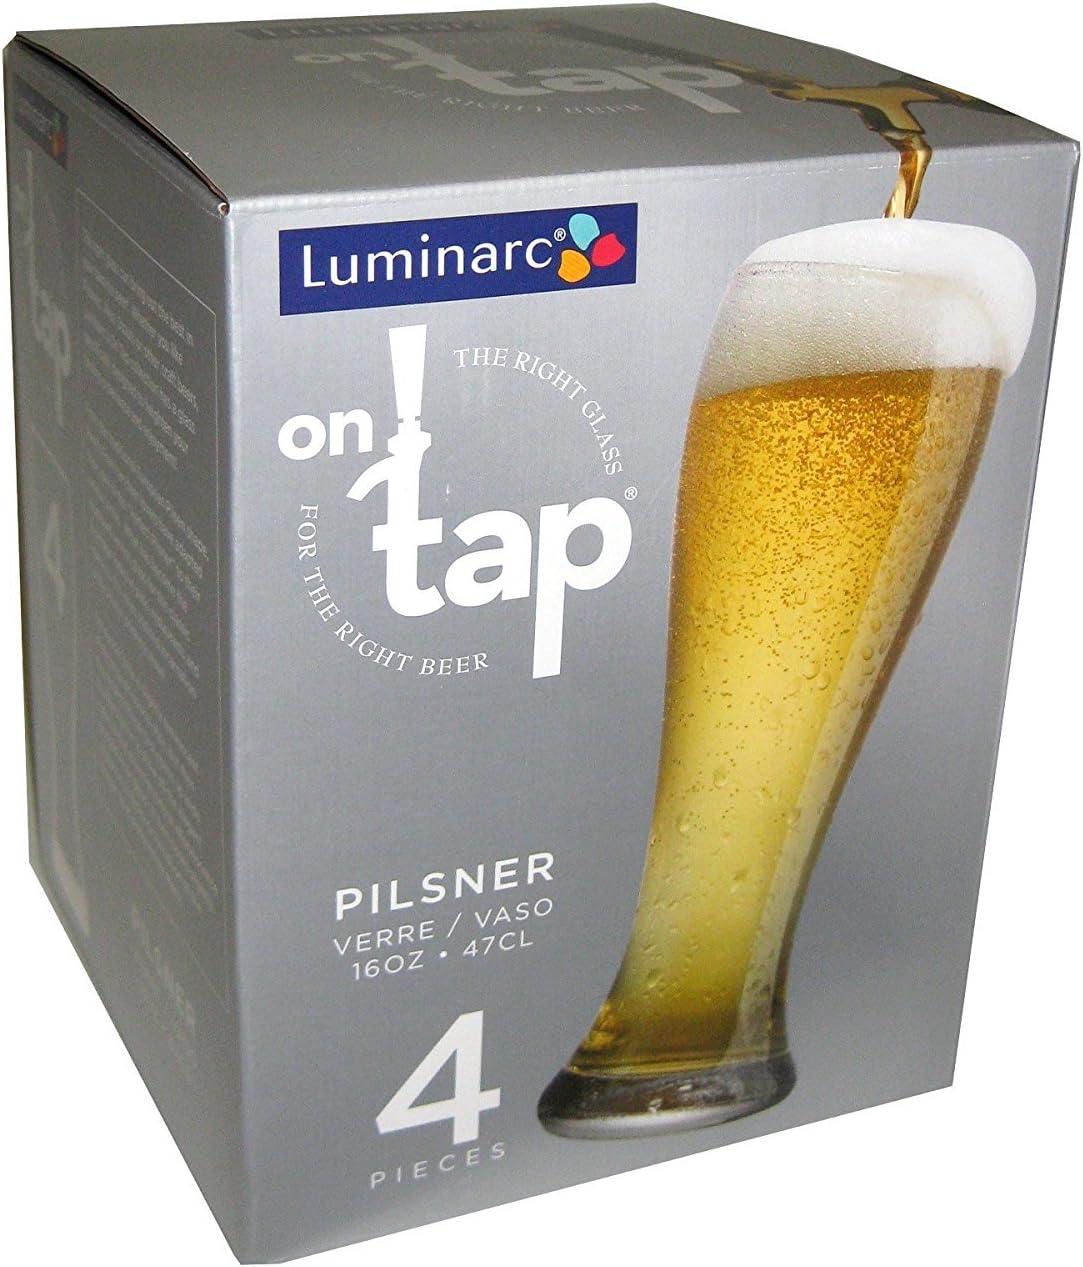 16-Ounce Luminarc on Tap 8-Piece Pilsner